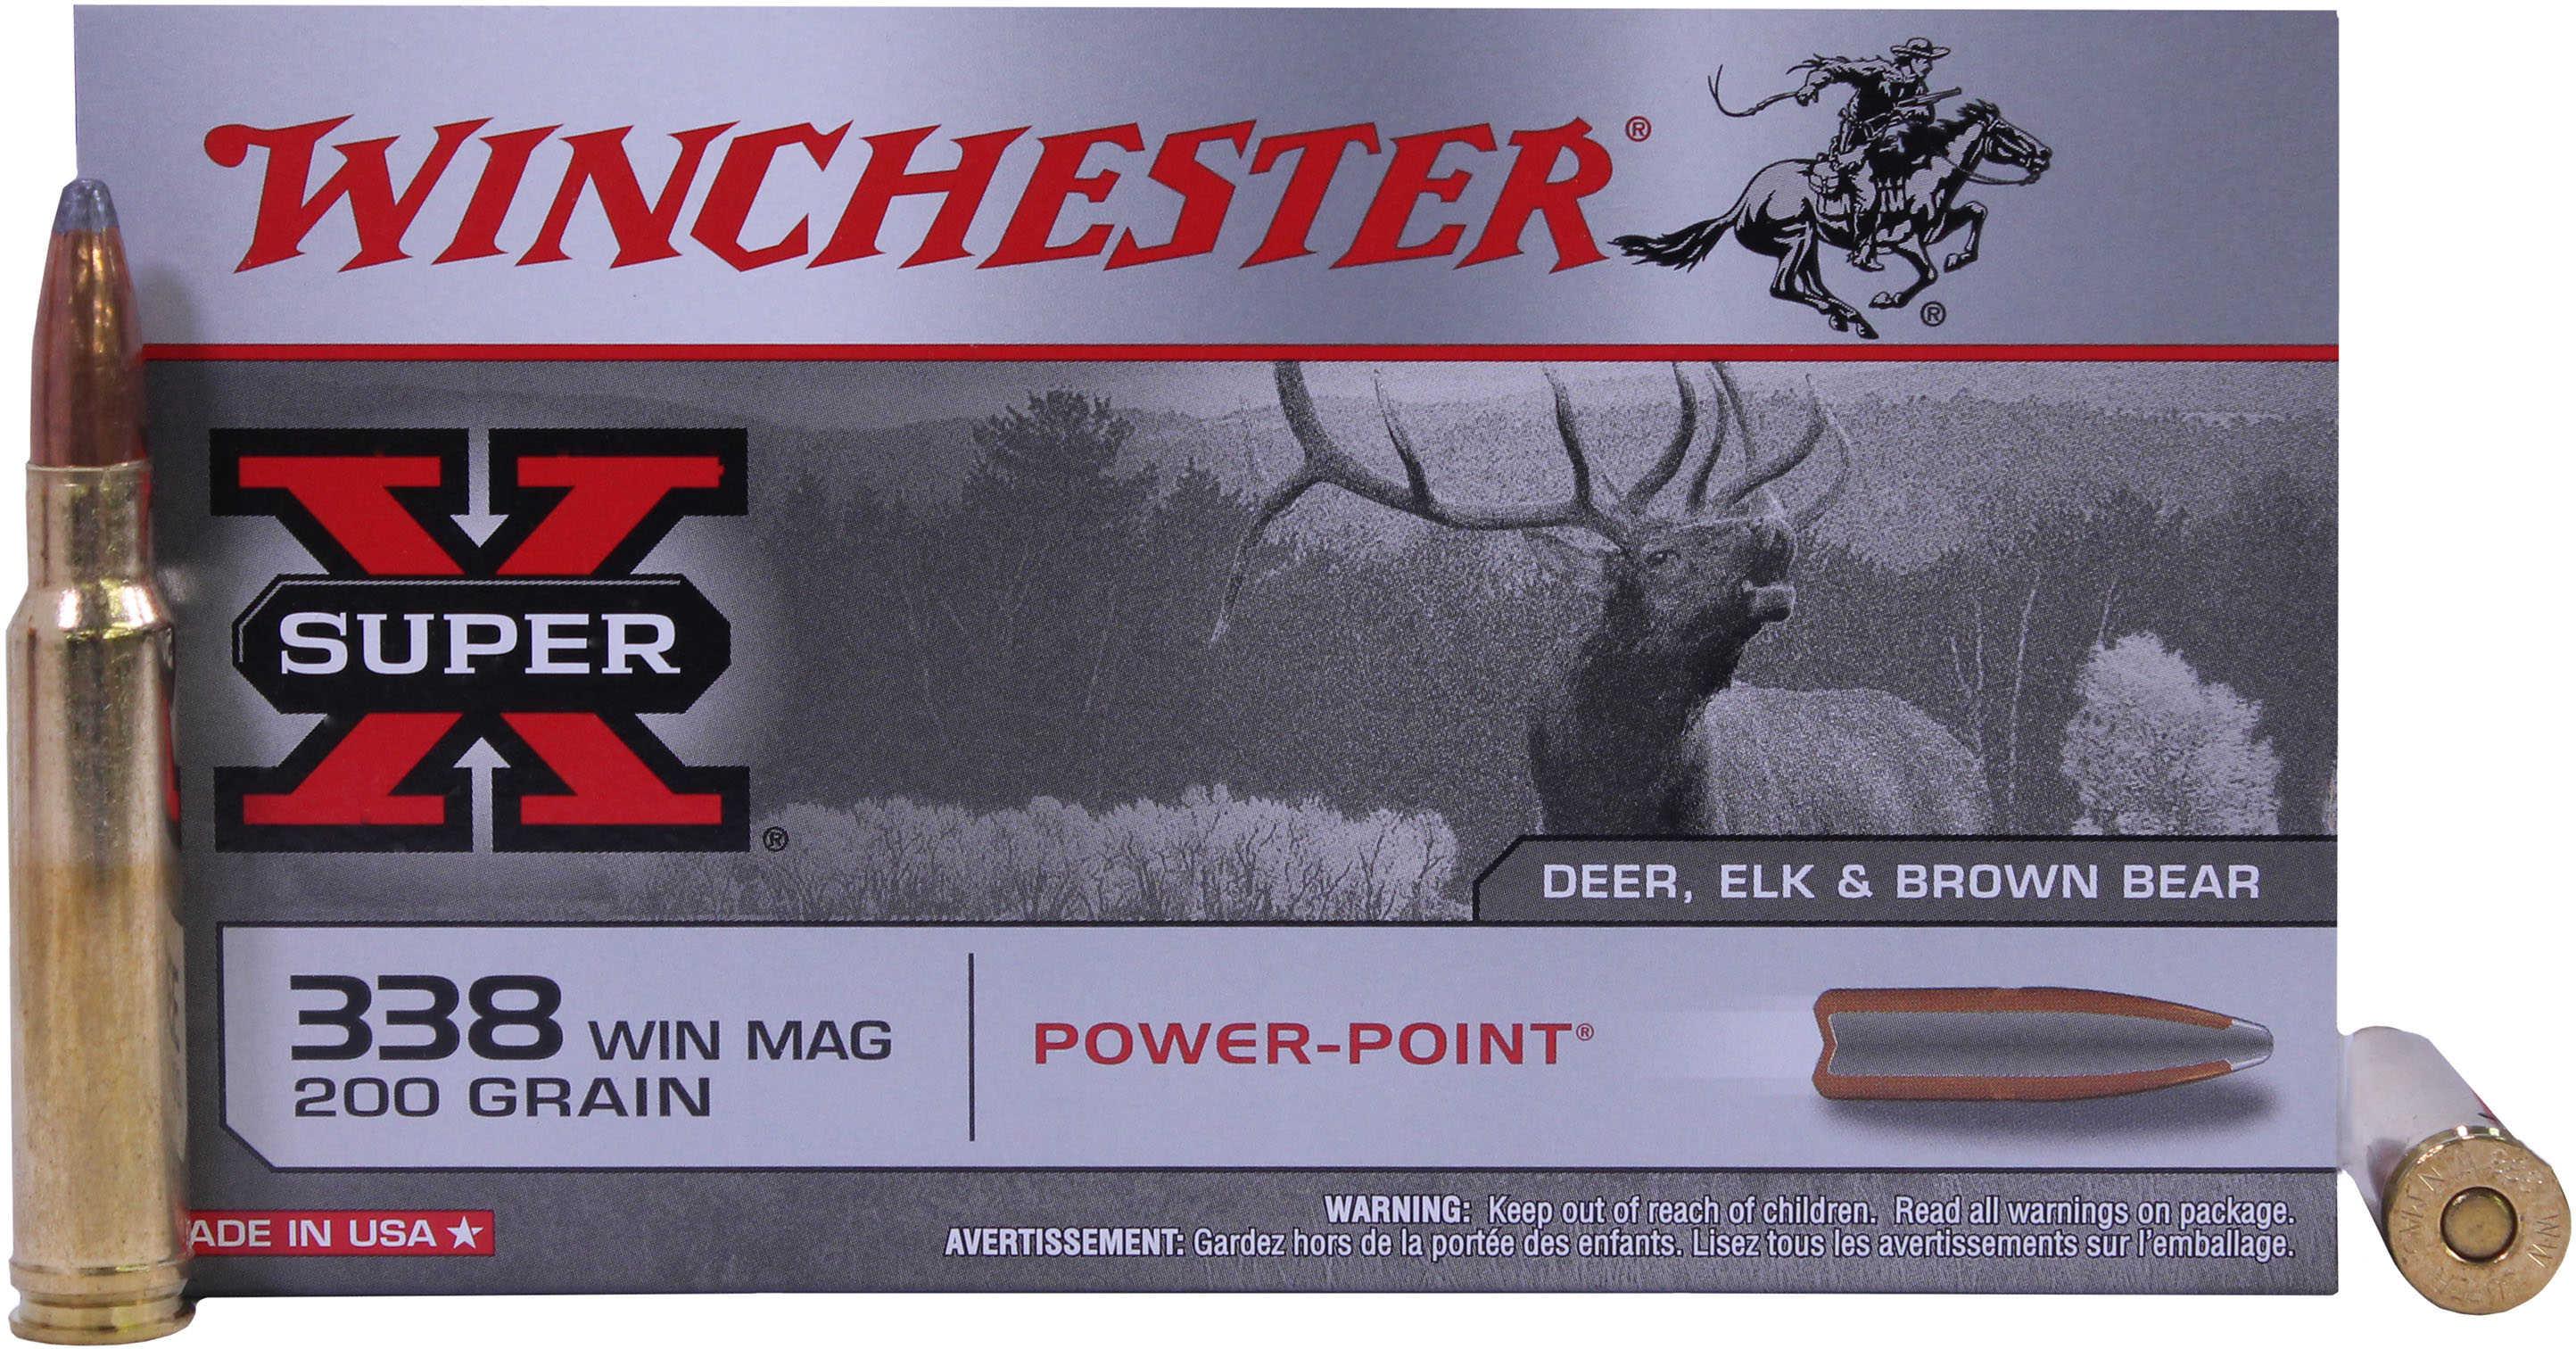 Winchester 338 Winchester Magnum 338 Win Magnum, 200gr, Super-X Power-Point, (Per 20) X3381